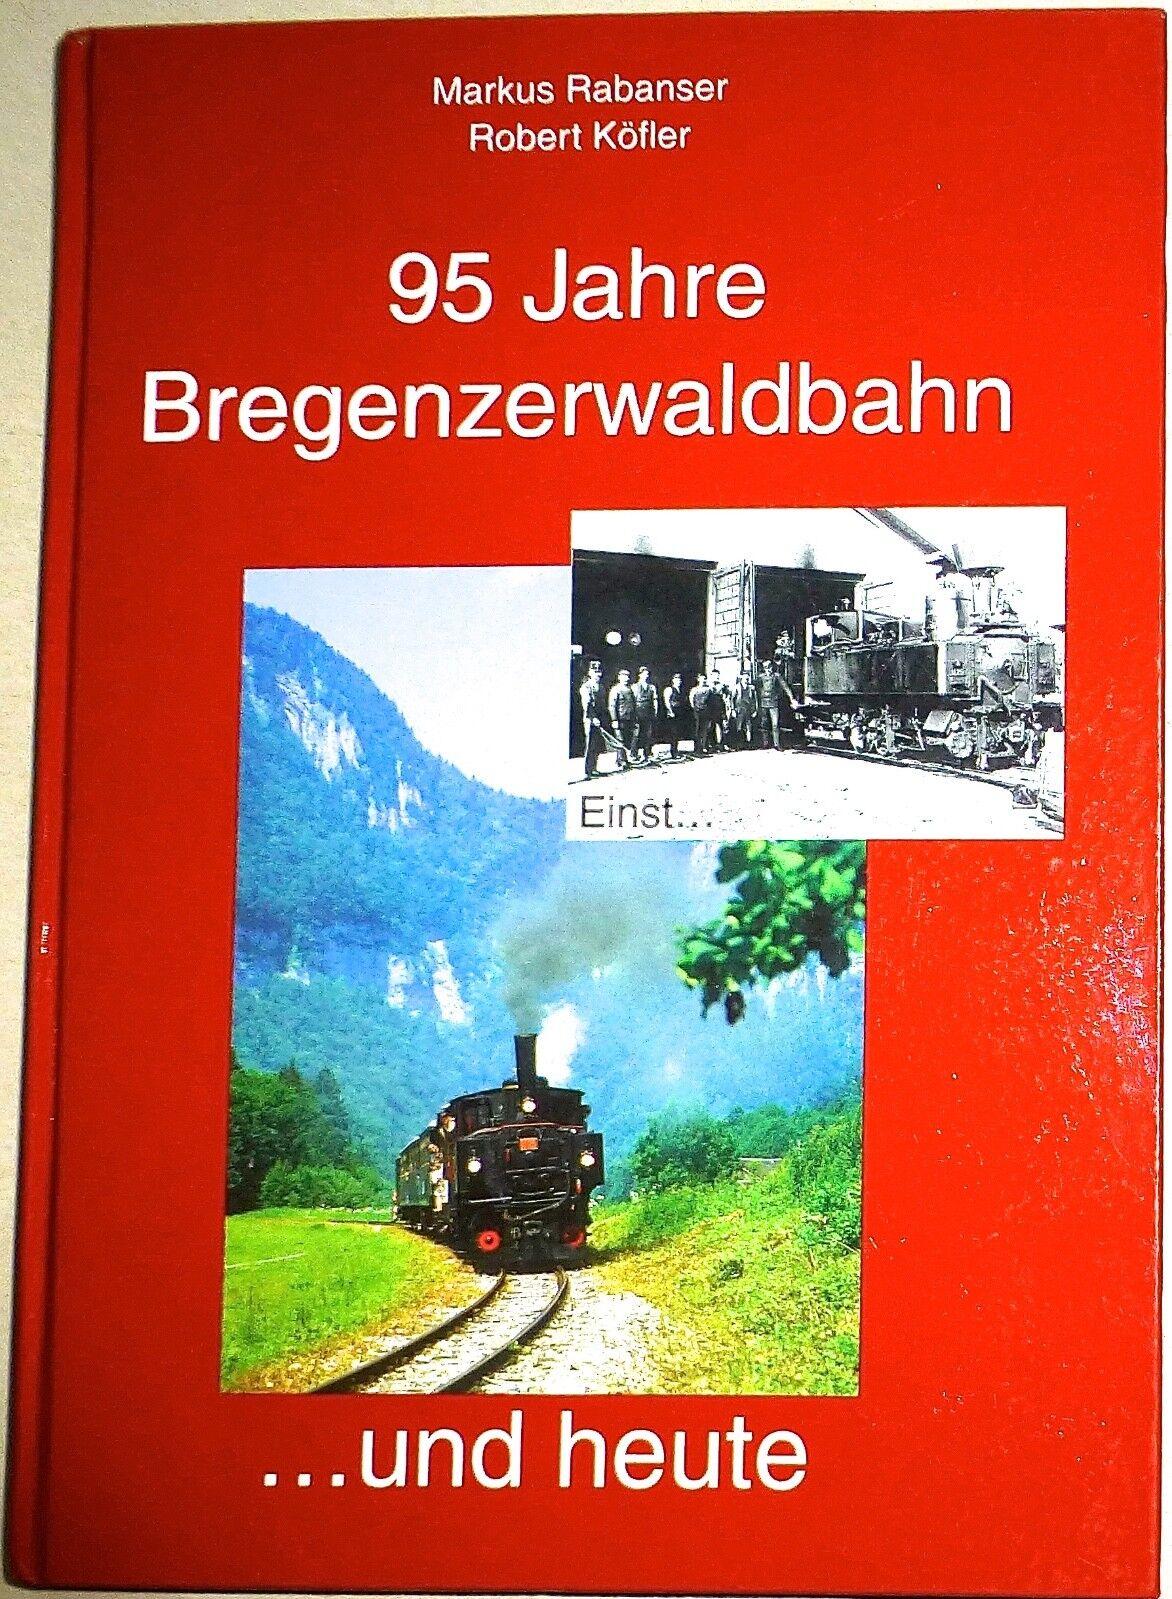 95 ANNI bregenzerwaldbahn registrazione e oggi RABANSER köfler MUSEO TRENI HG4